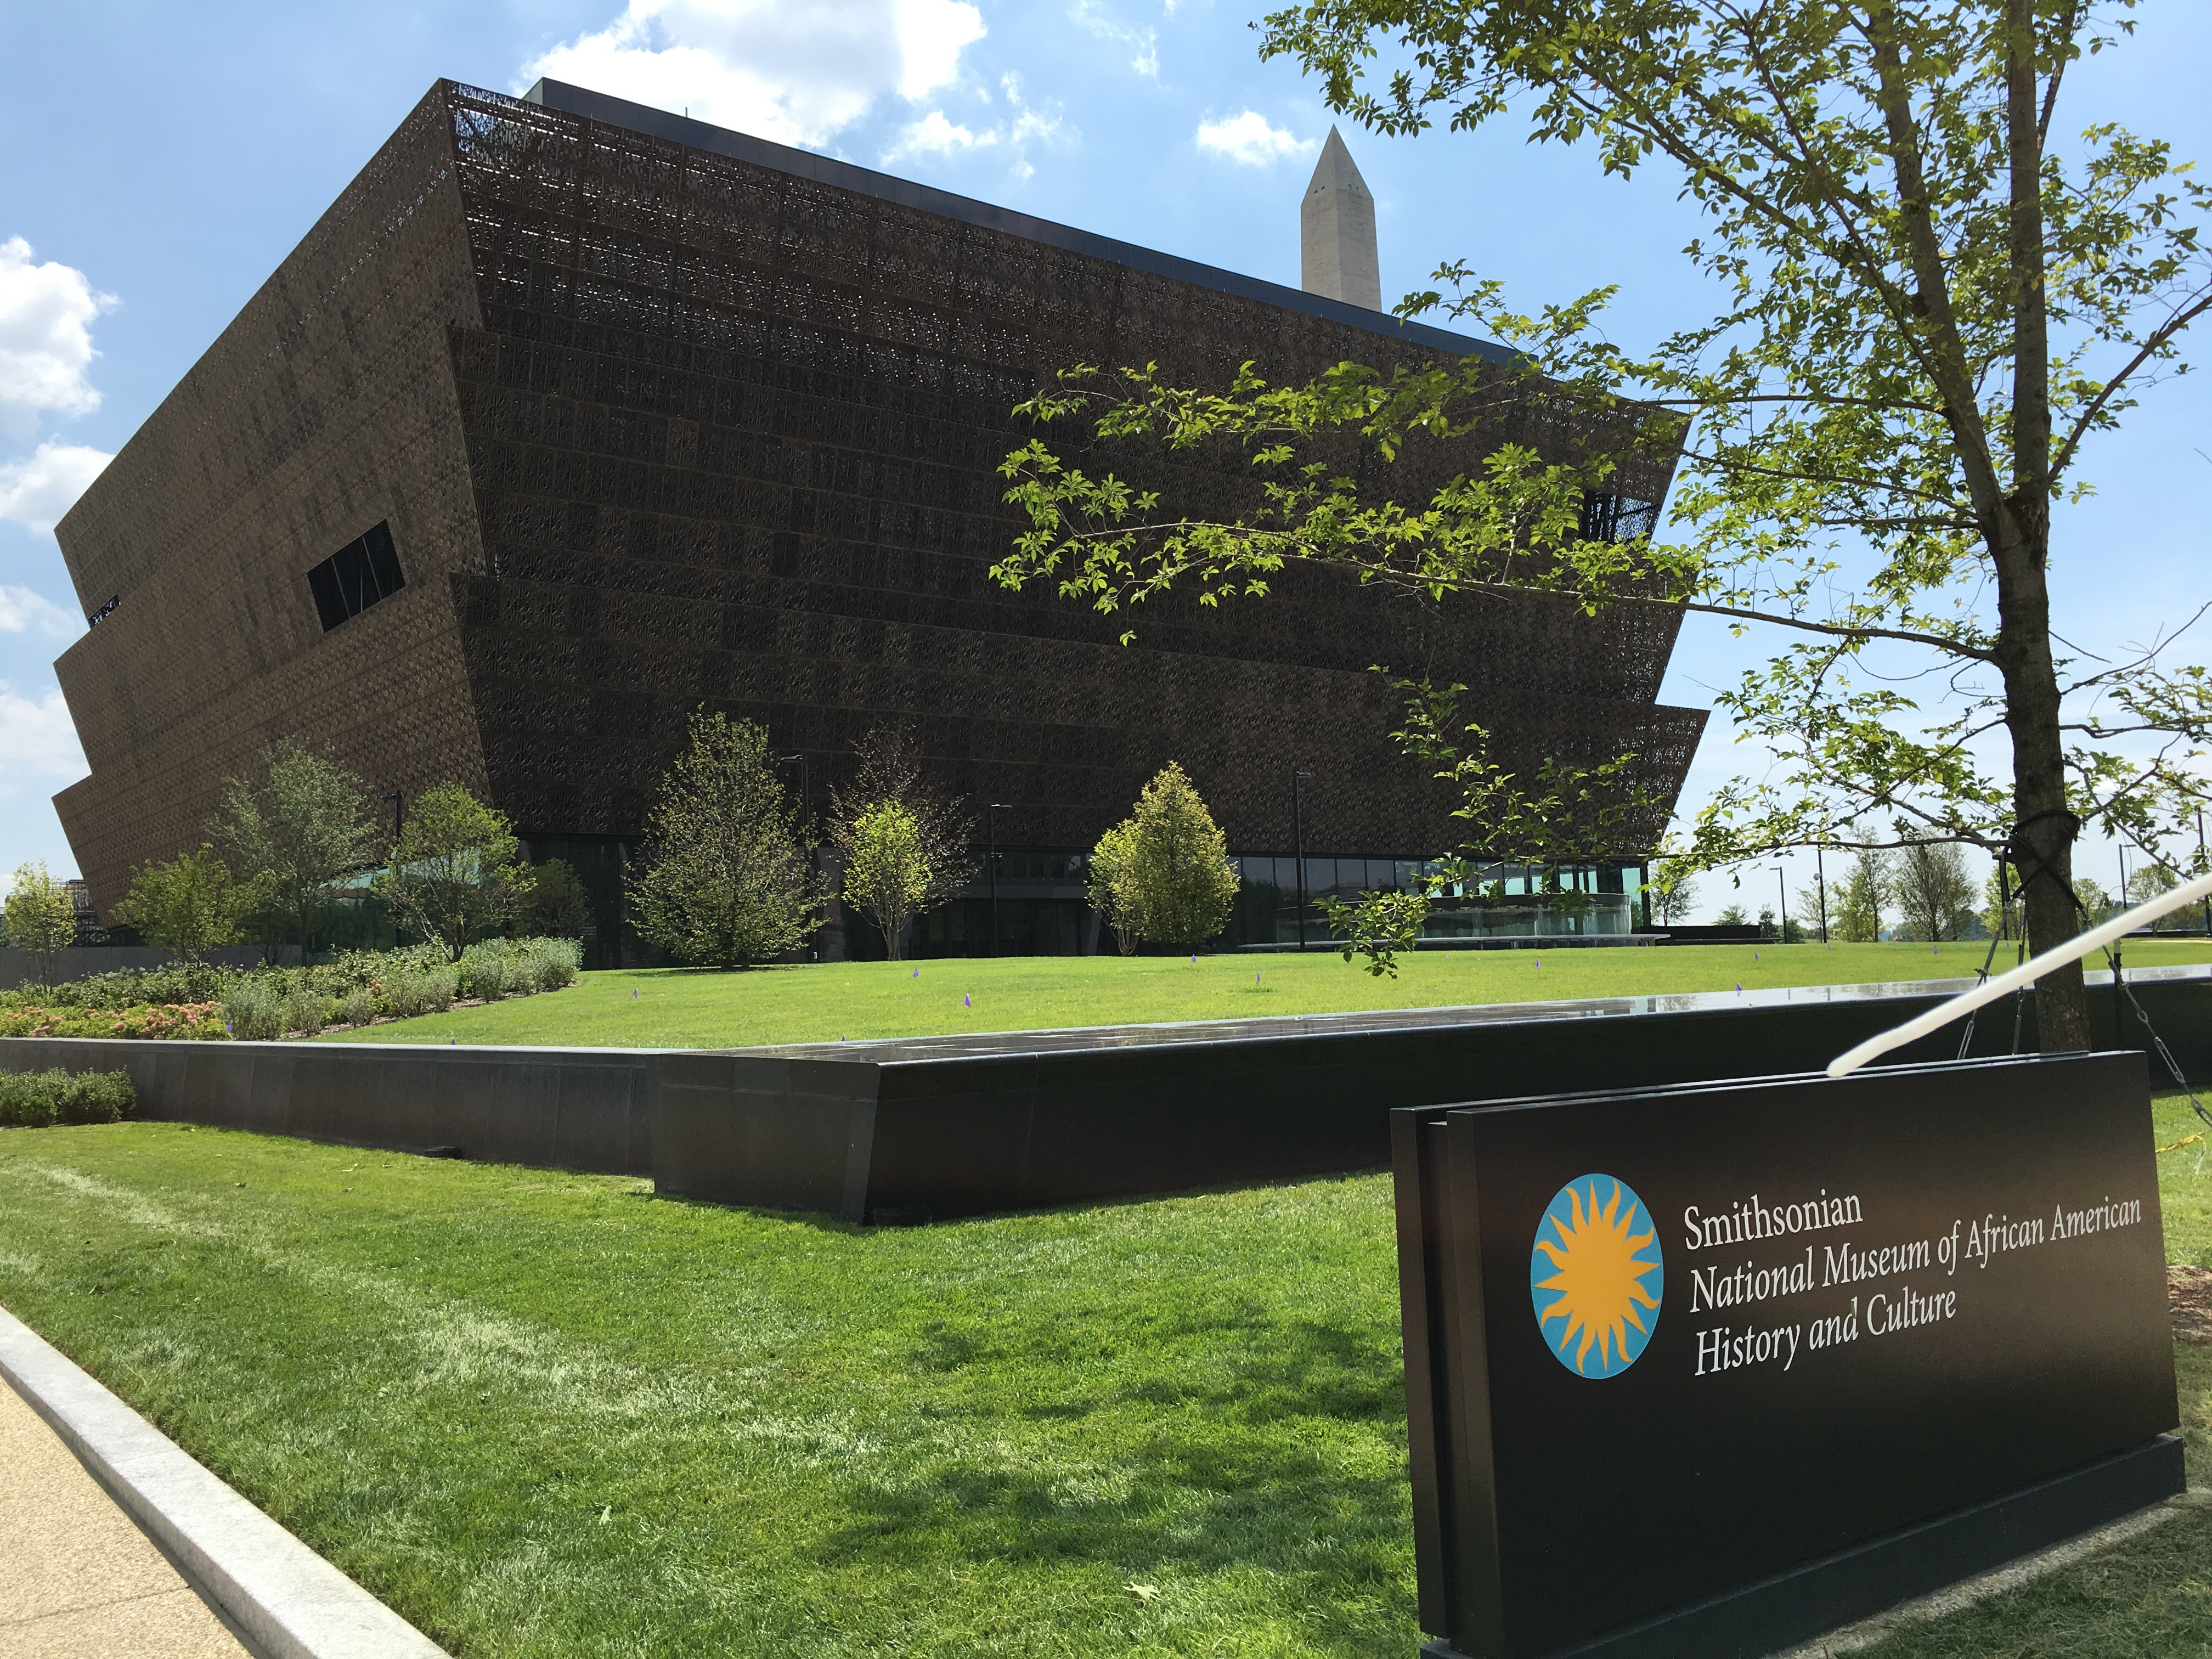 Smithsonian Museum Washington D.C.